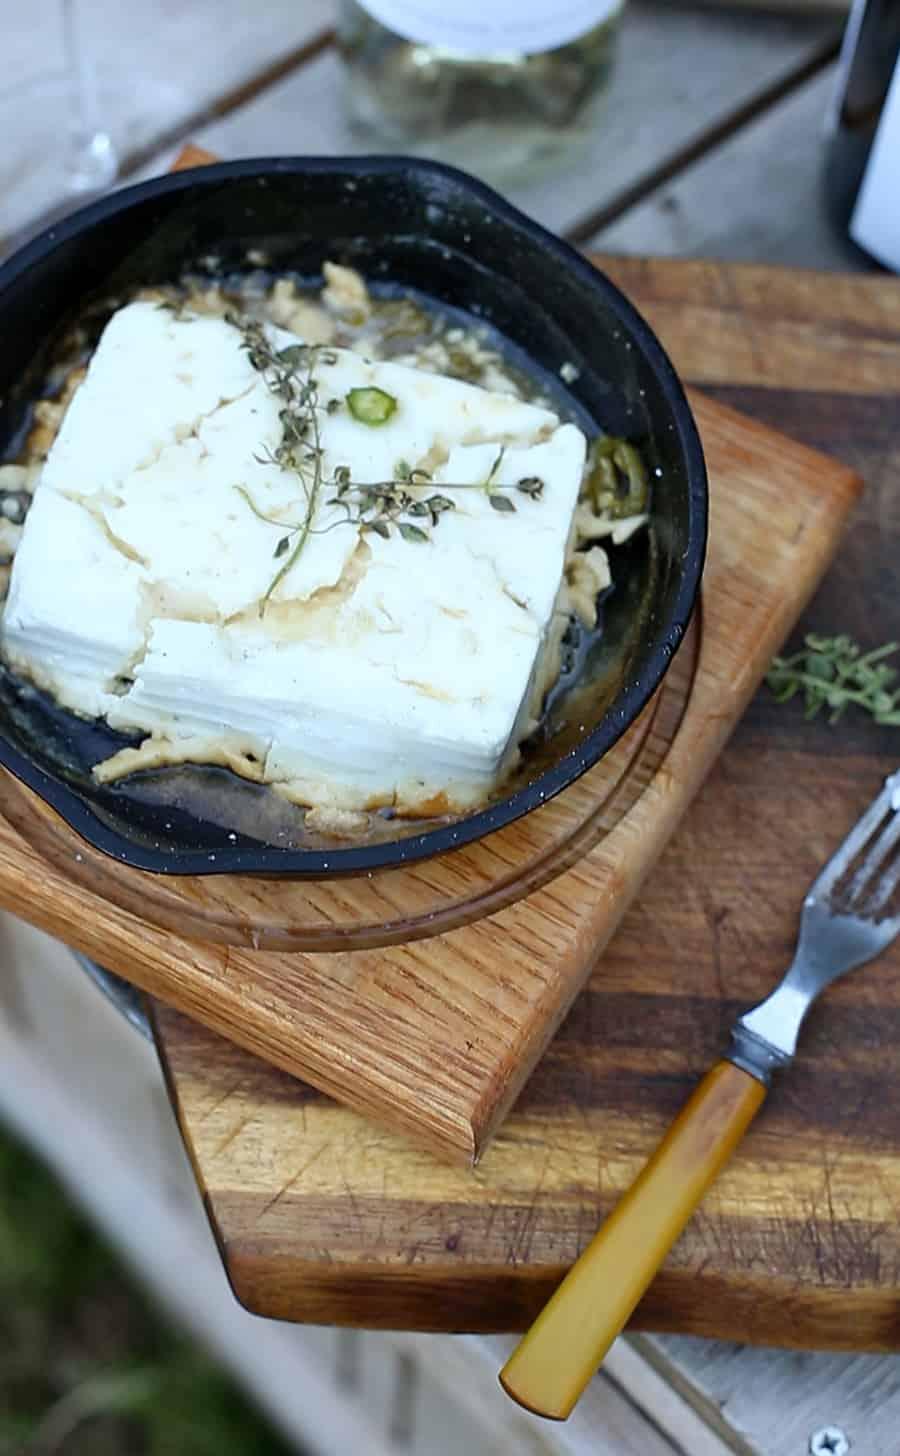 Creamy skillet roasted hot feta dip